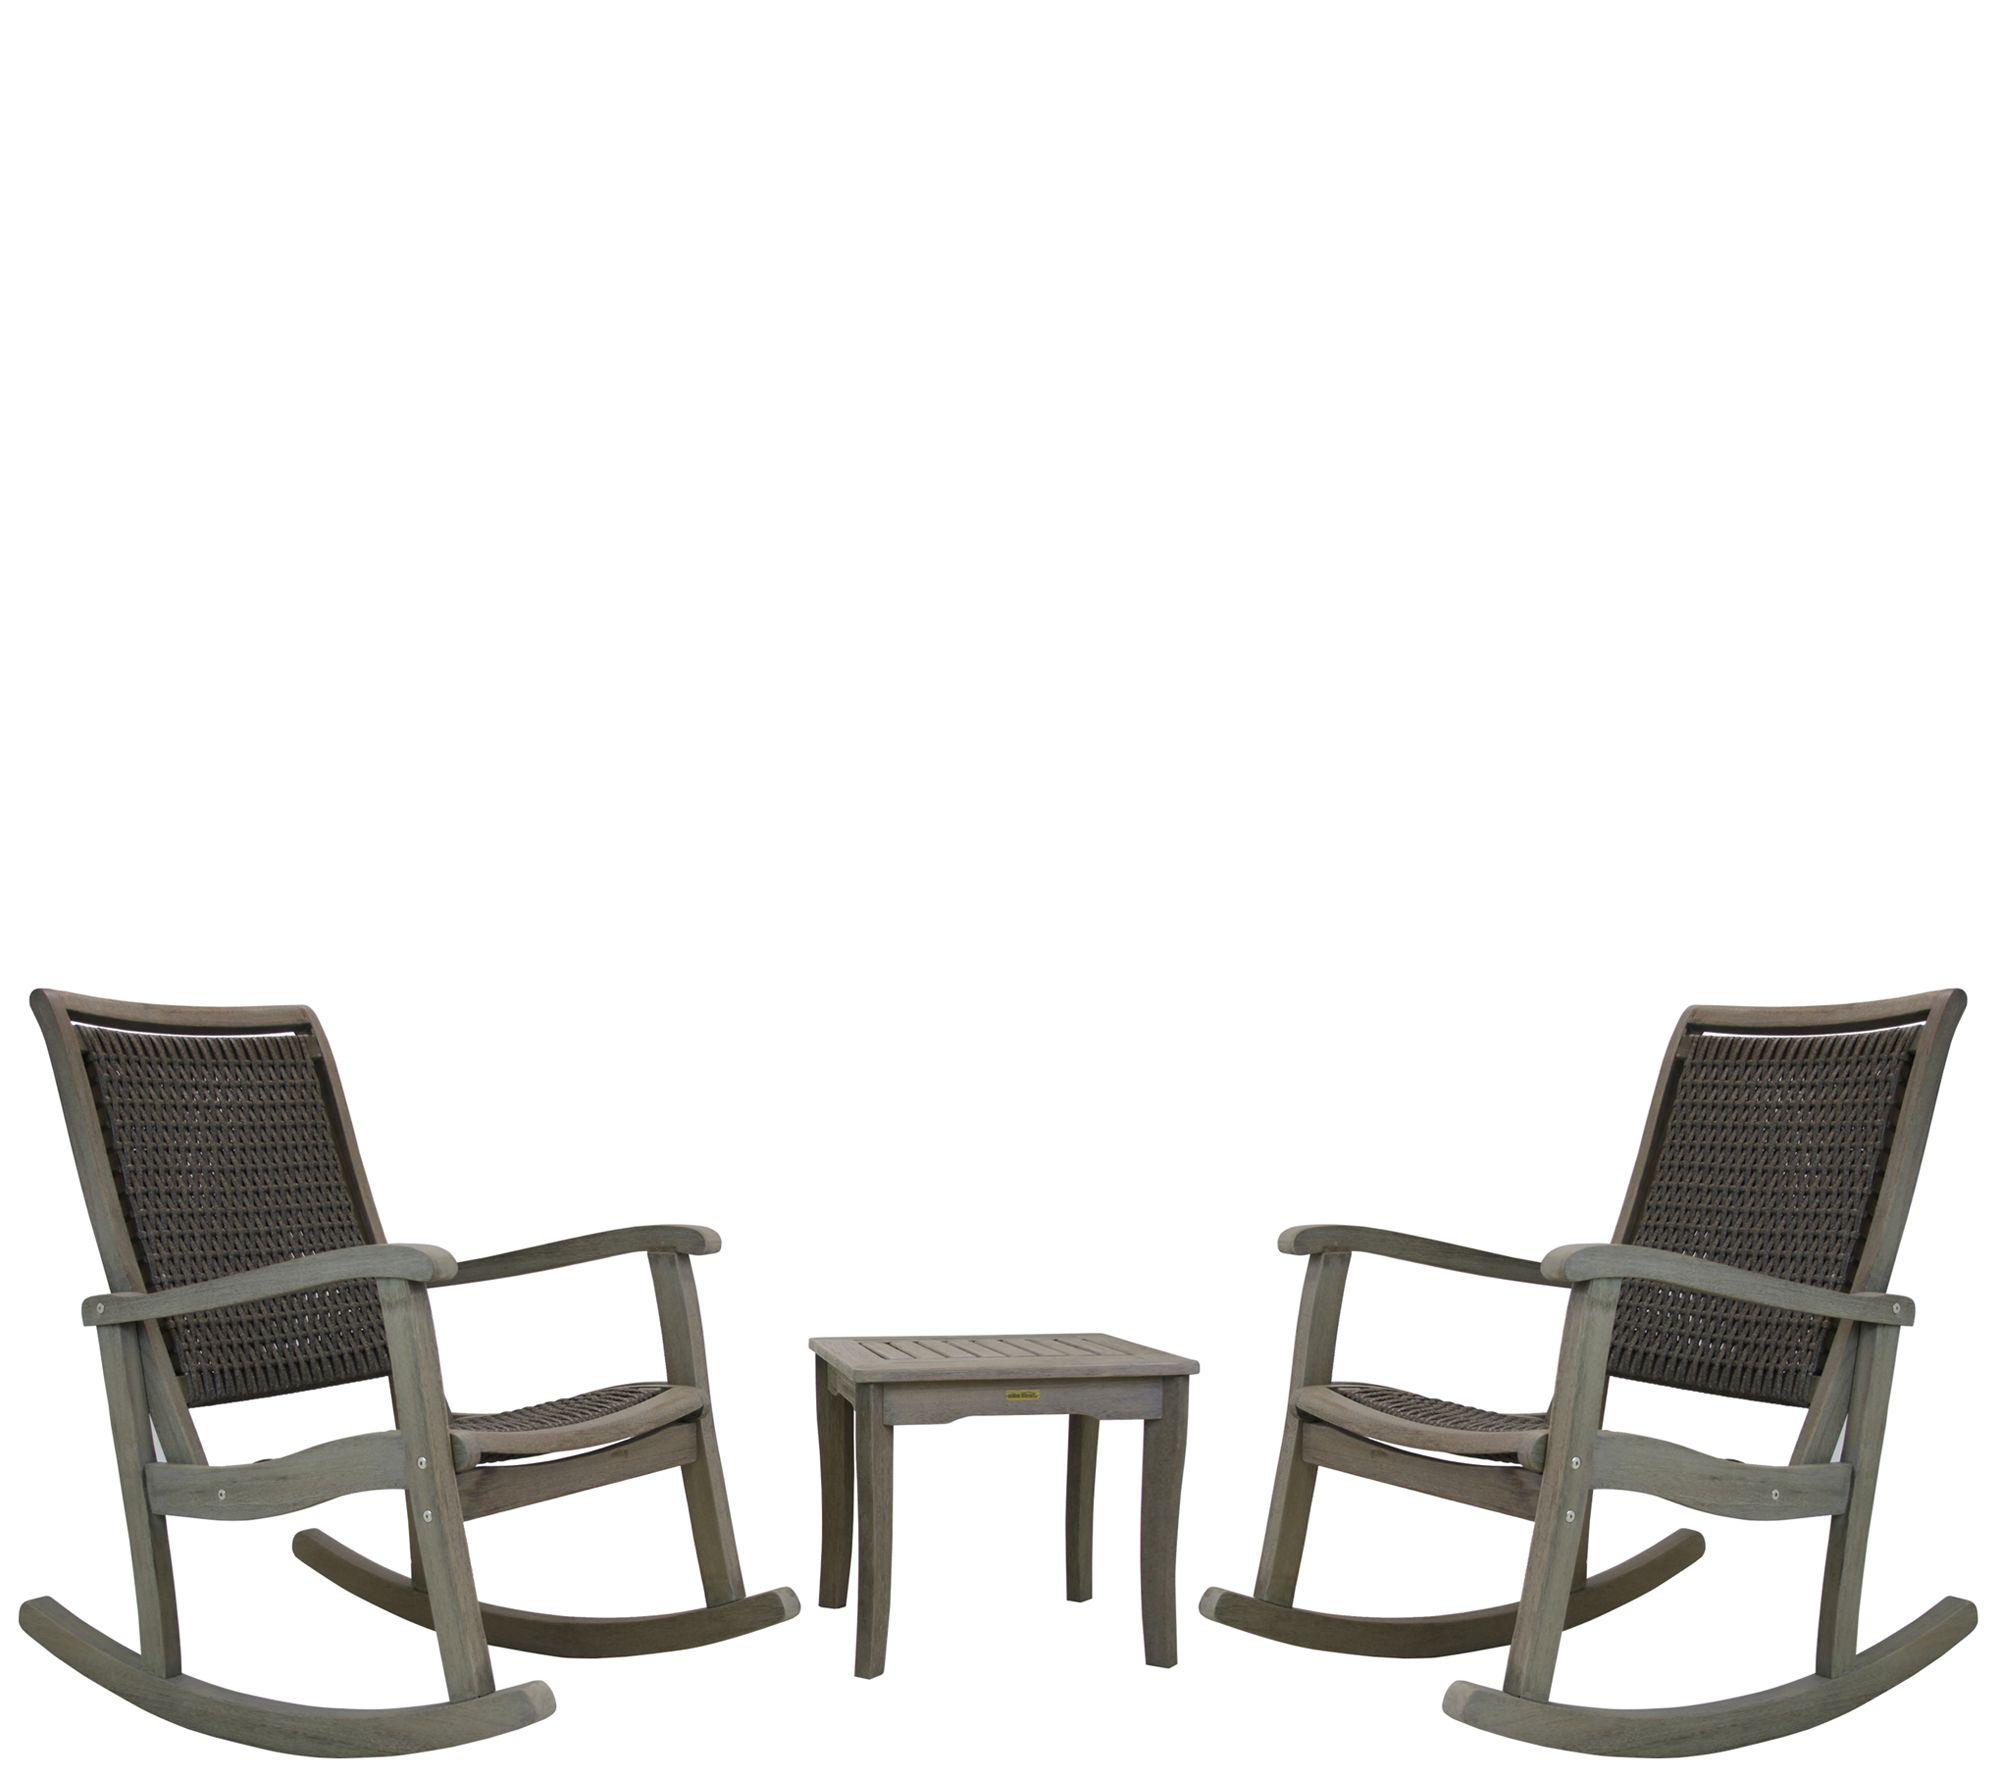 Prime 3 Piece Gray Wash Eucalyptus Rocking Chair Set Qvc Com Cjindustries Chair Design For Home Cjindustriesco